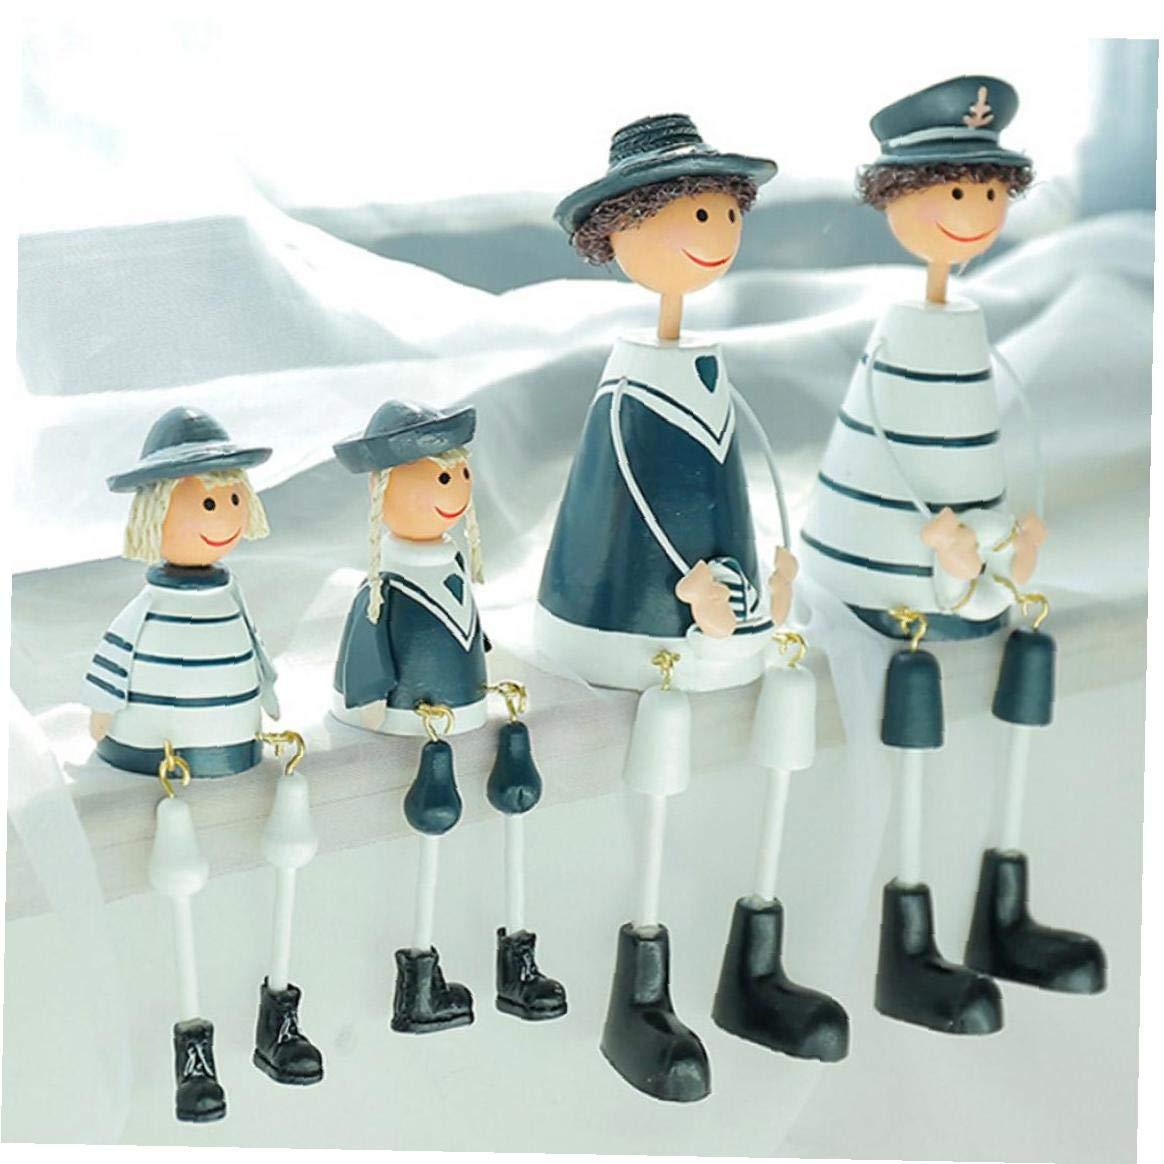 IUwnHceE 4pcs Set del Buque De Guerra Marinero Armada Mediterr/ánea Figurines Sentado Familia Marinero Estatua Resign HPainted Estatua Ornamento del Regalo para La Casa Oficina Exterior Sala